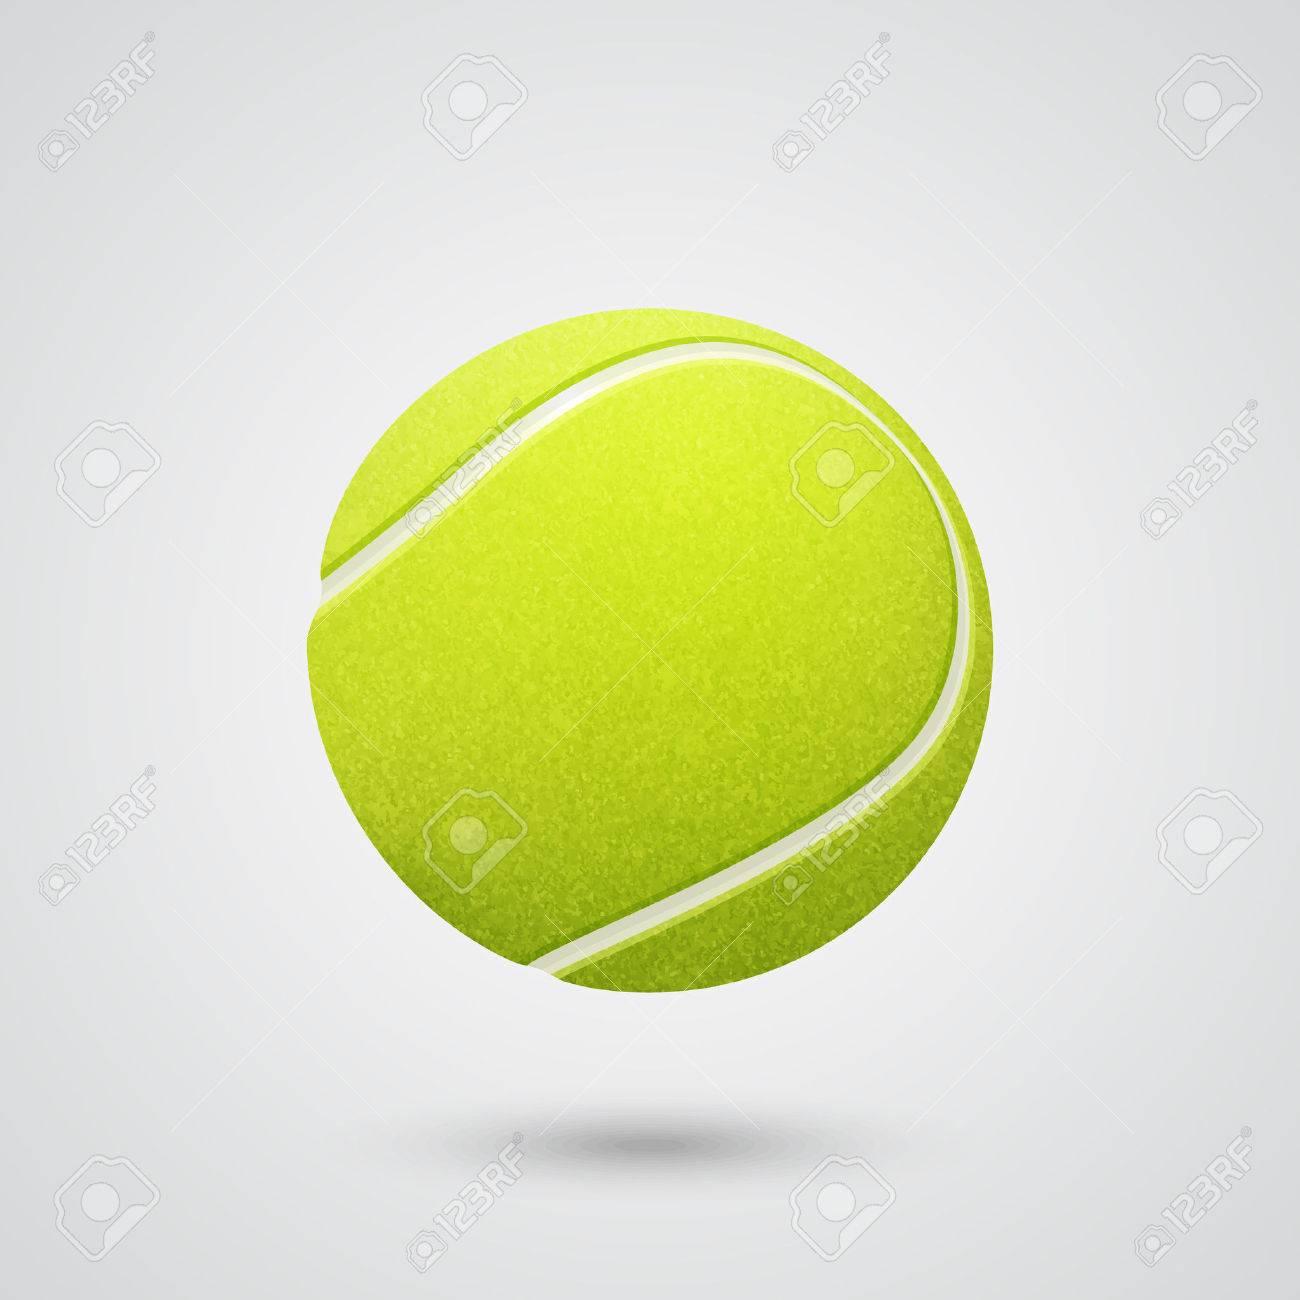 3d realistic tennis ball. - 39878976